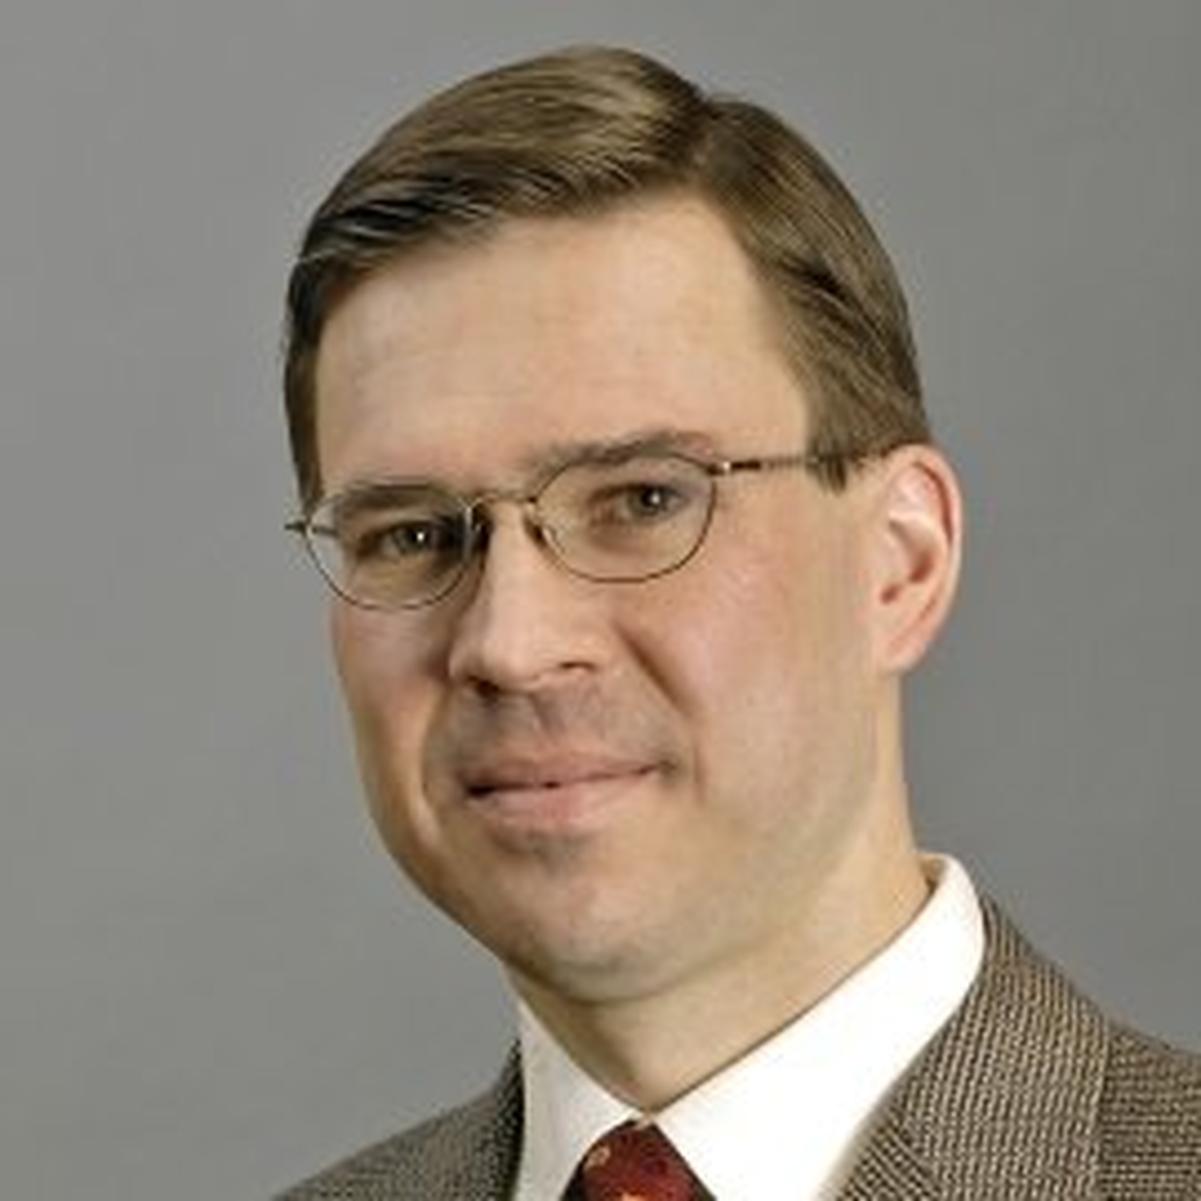 Witold Henisz wiki, Witold Henisz bio, Witold Henisz news